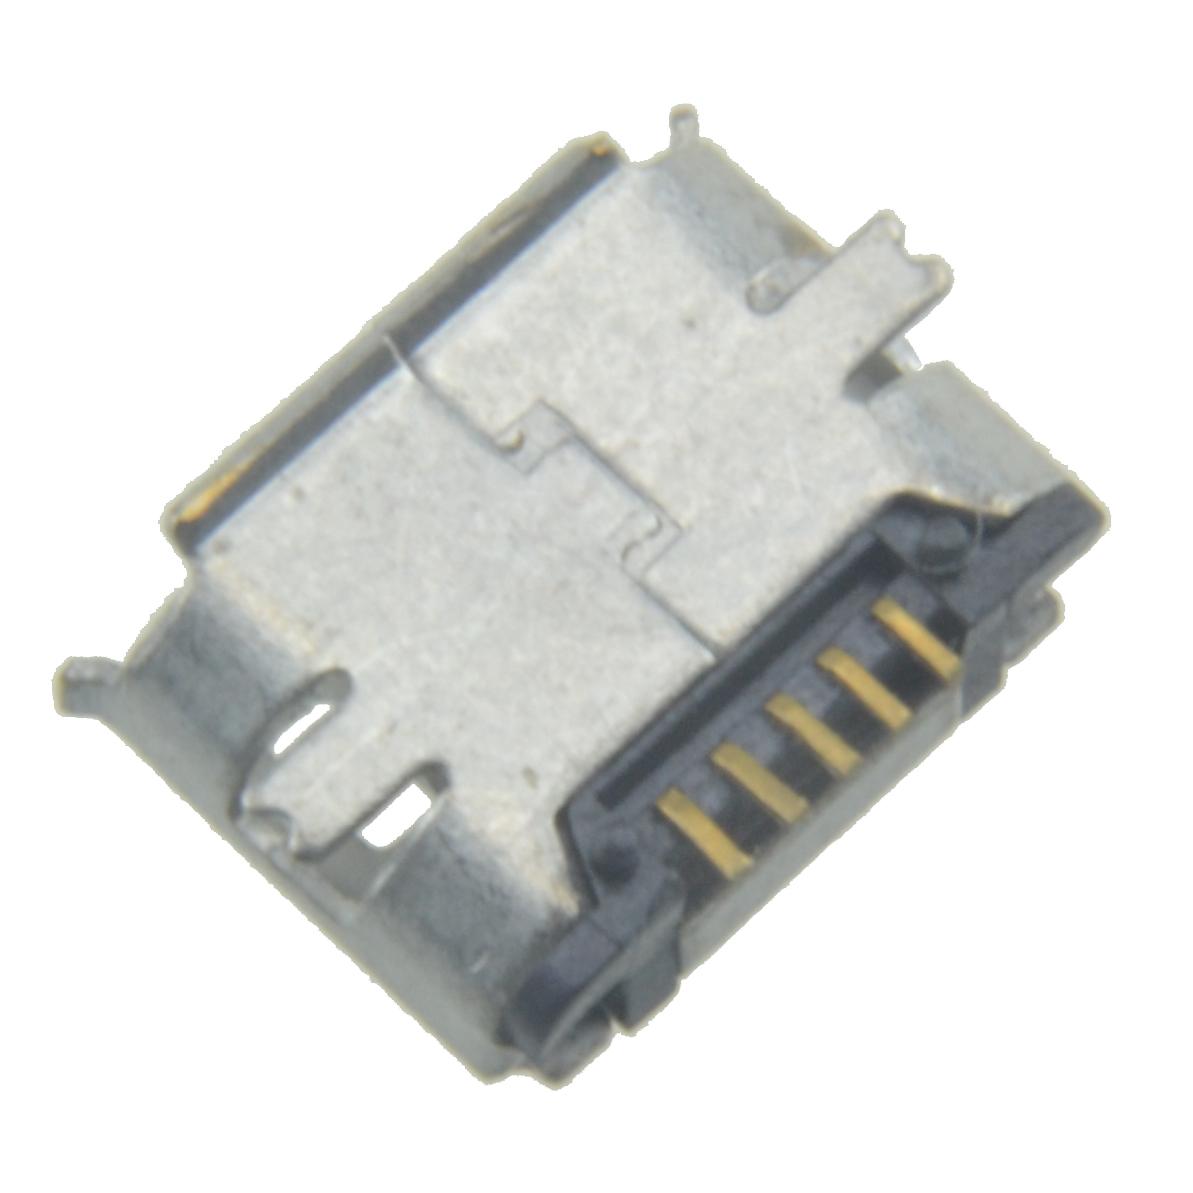 Pcs micro usb pin b type female jack socket connector